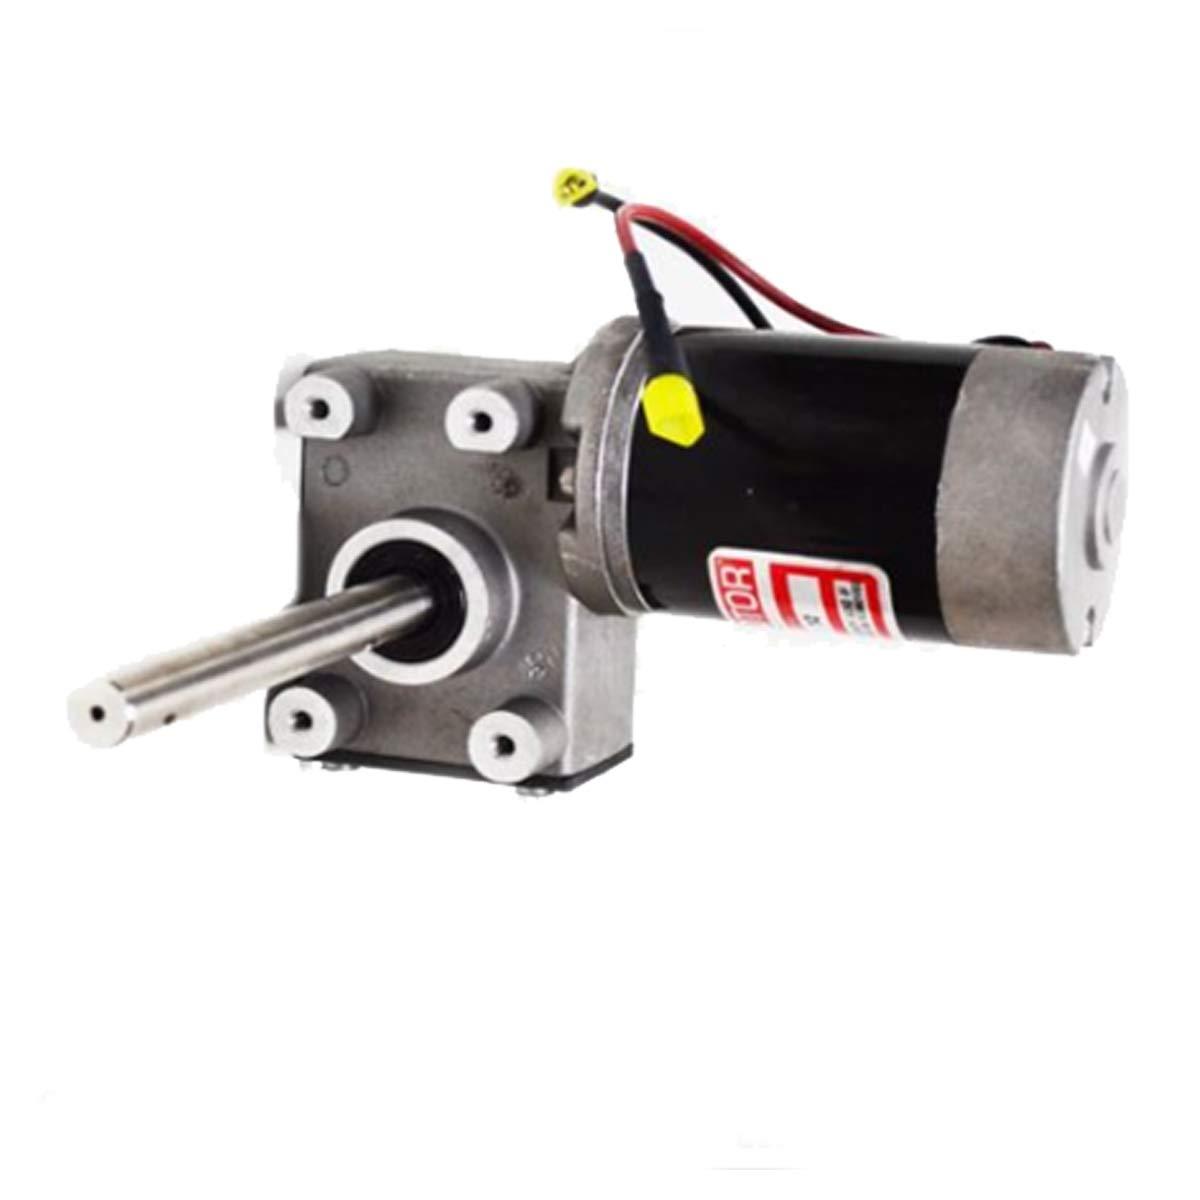 Salt Spreader Motor Gear Box Kit for SnowEx 575 1075 D6106 D6107 D6107-06 by Replaces SnowEX